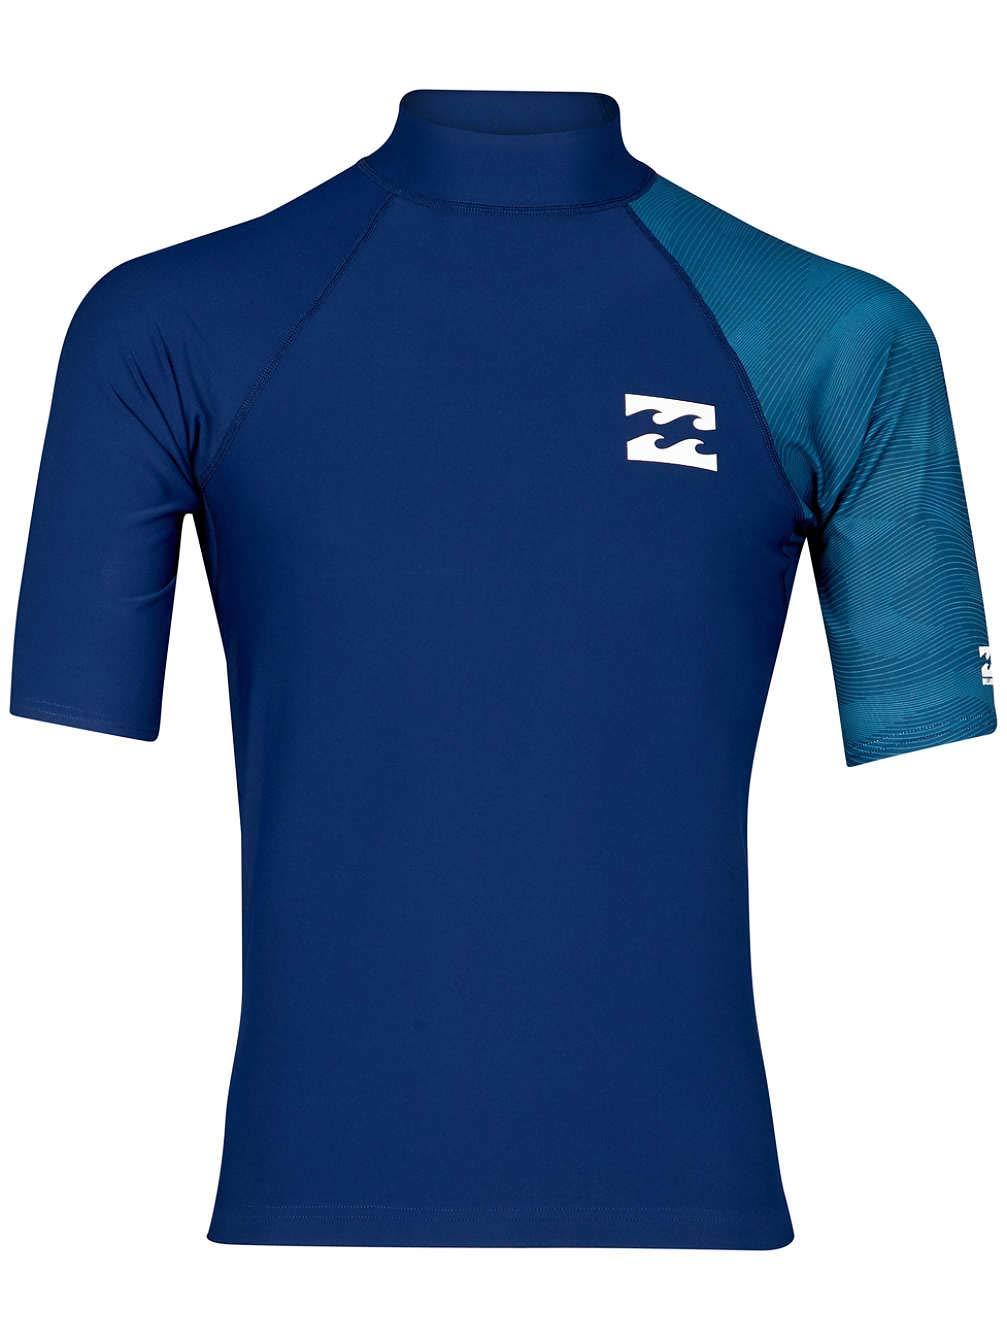 Billabong Unity manica corta Rash Vest in blu scuro